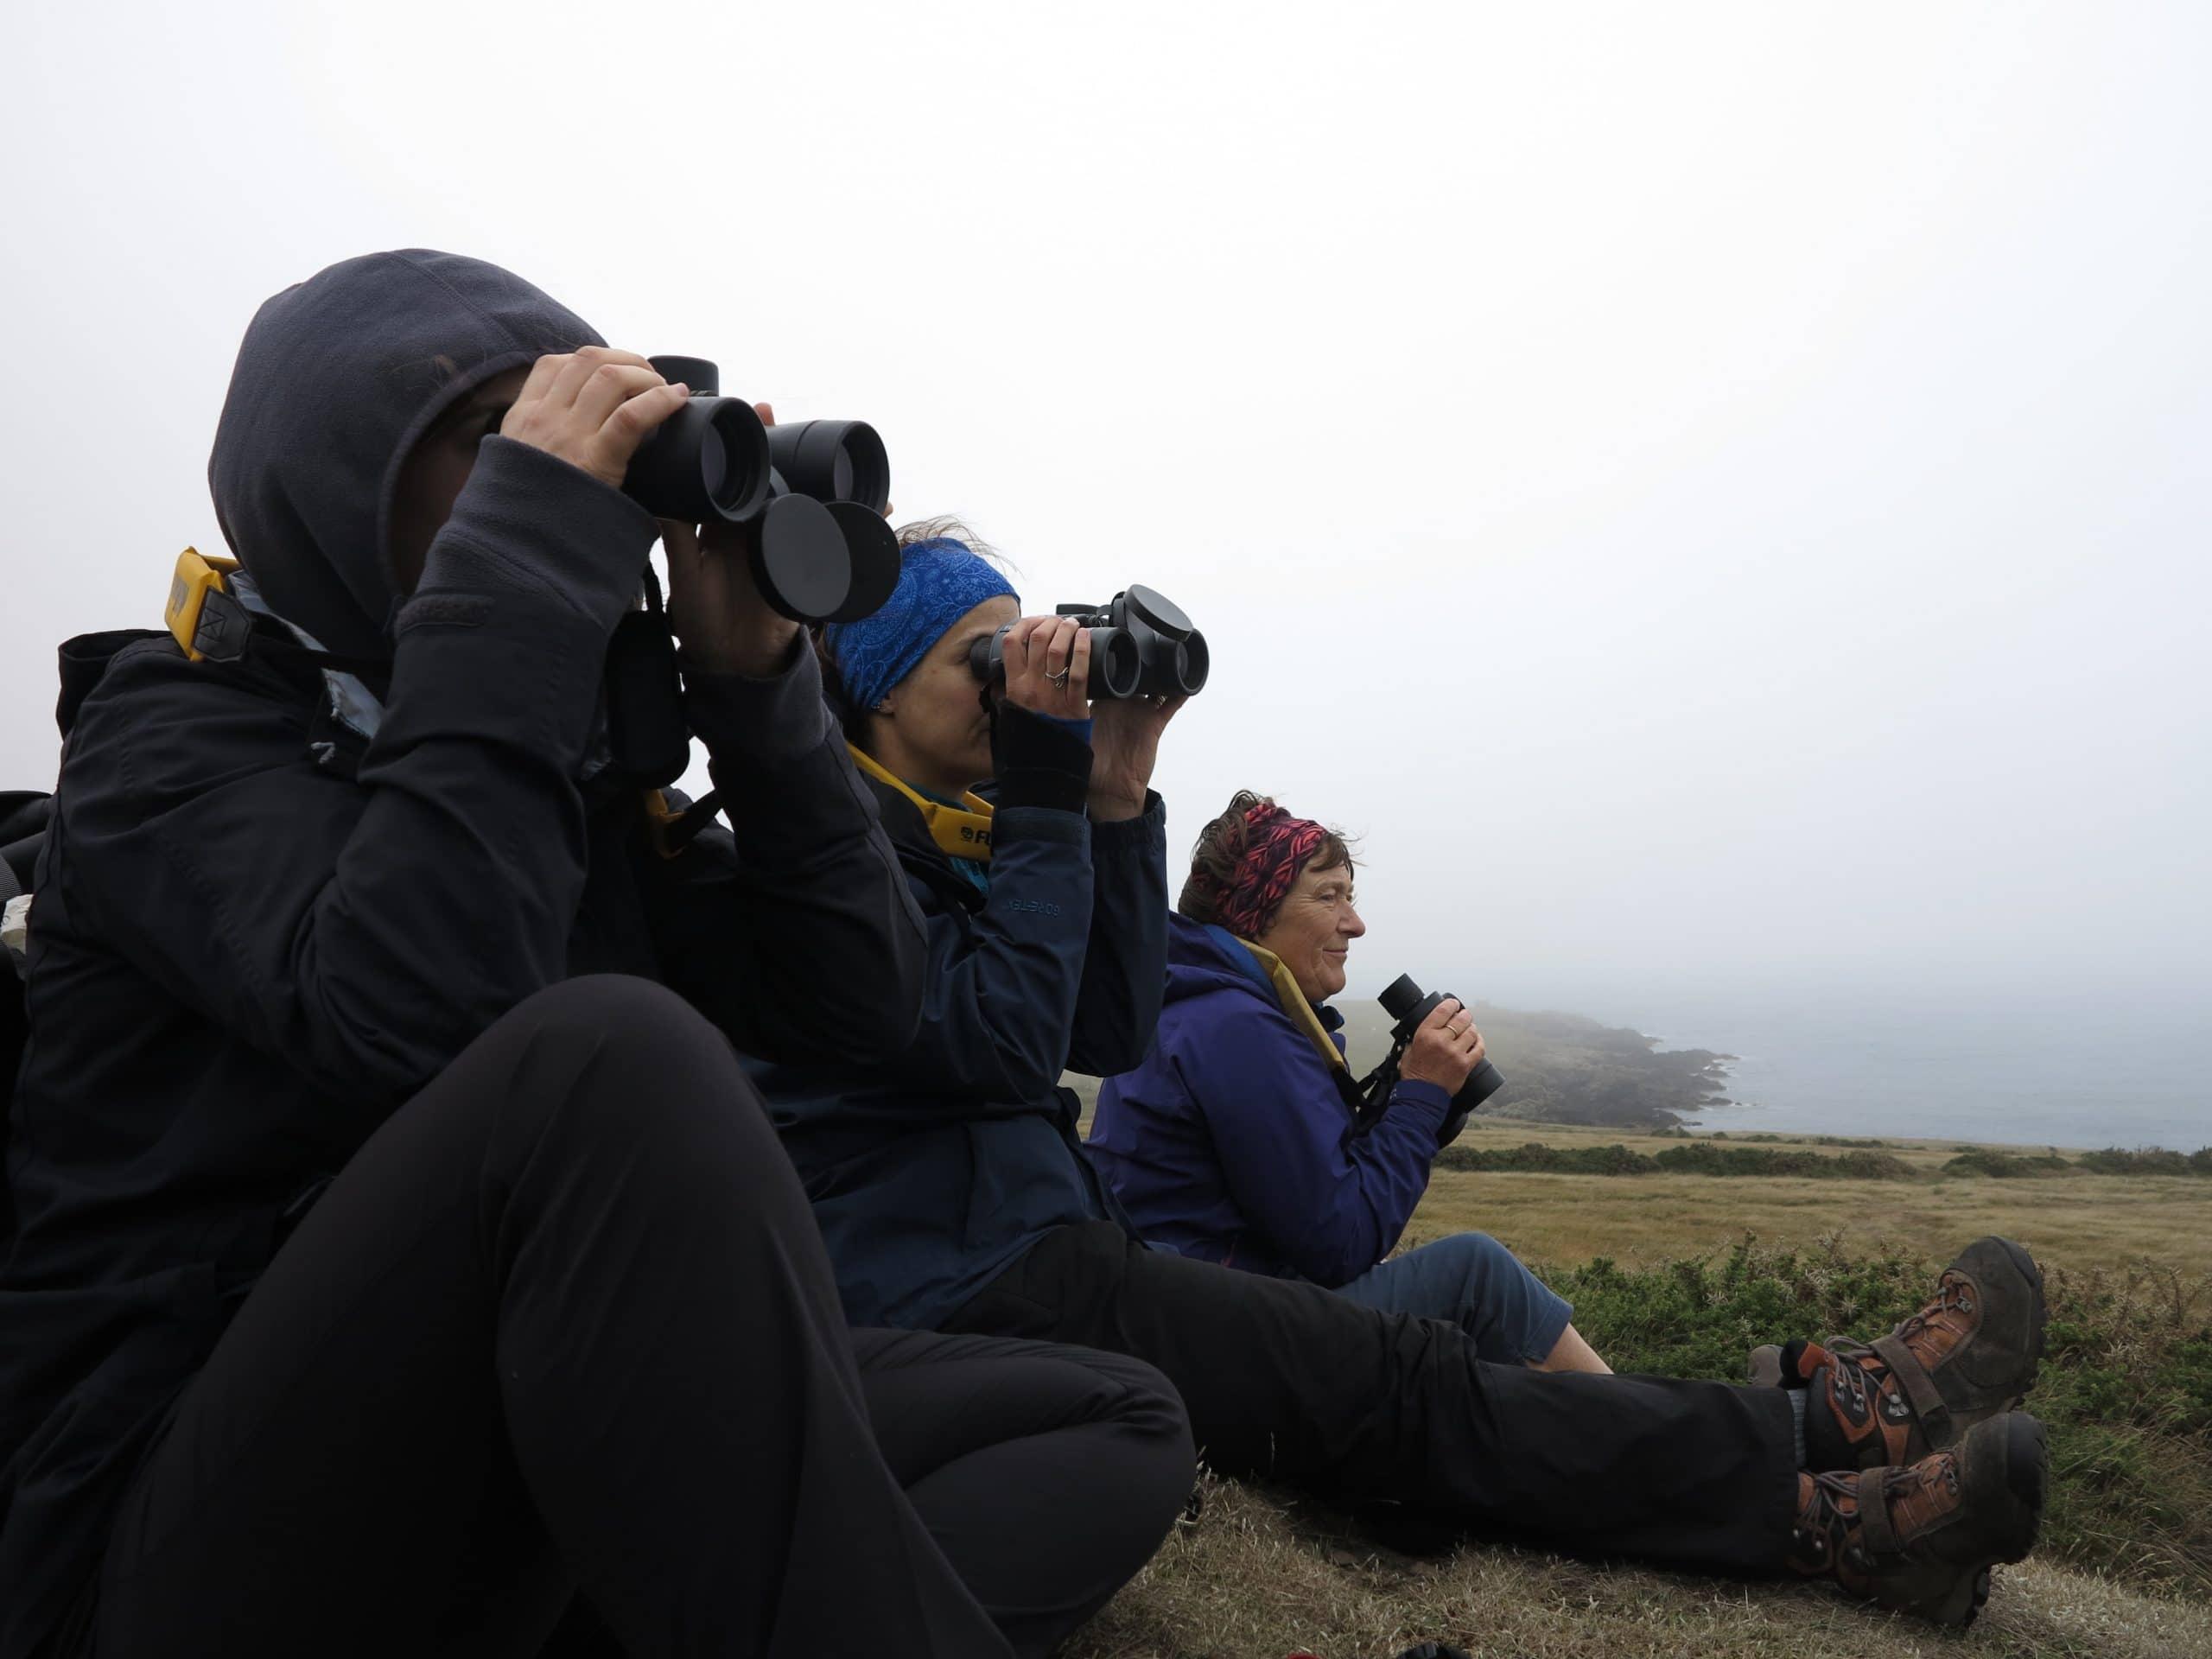 Volunteers with binoculars